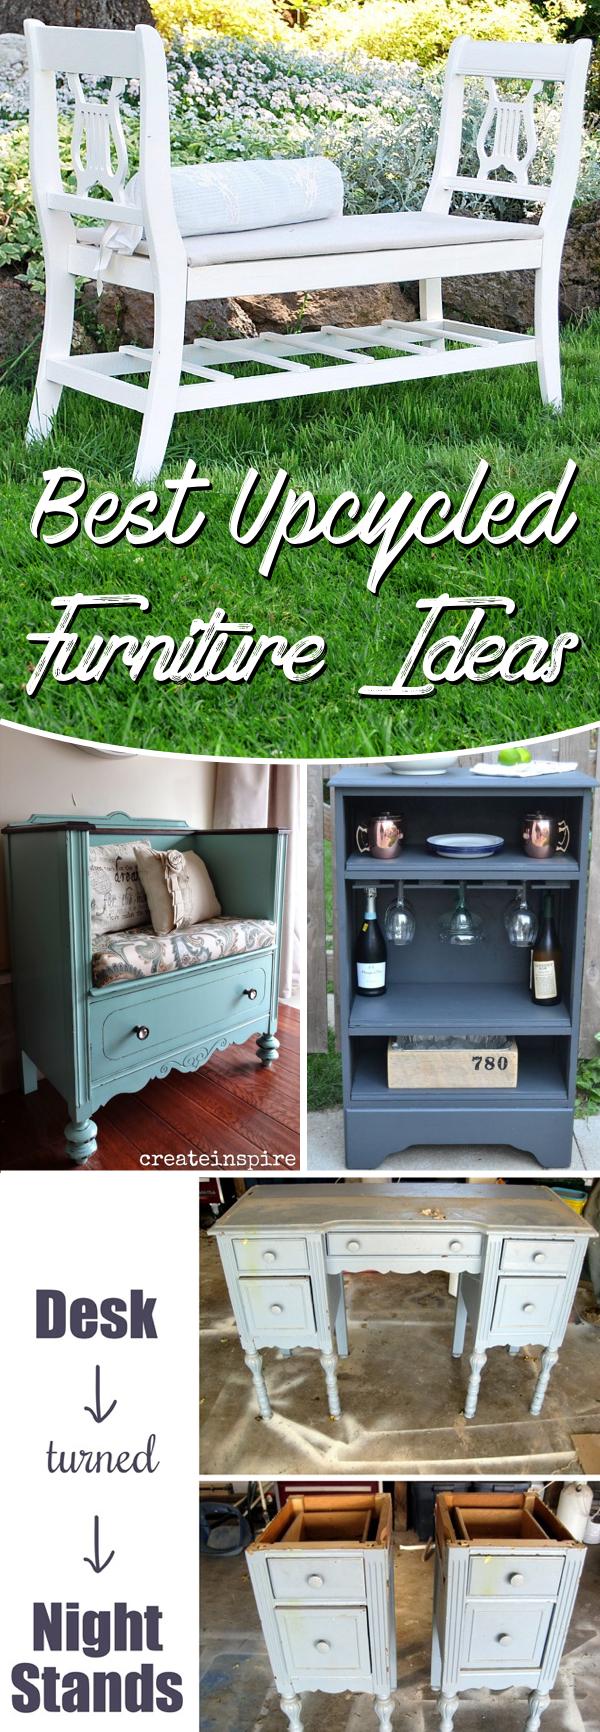 20 Upcycled Furniture Ideas Breathing